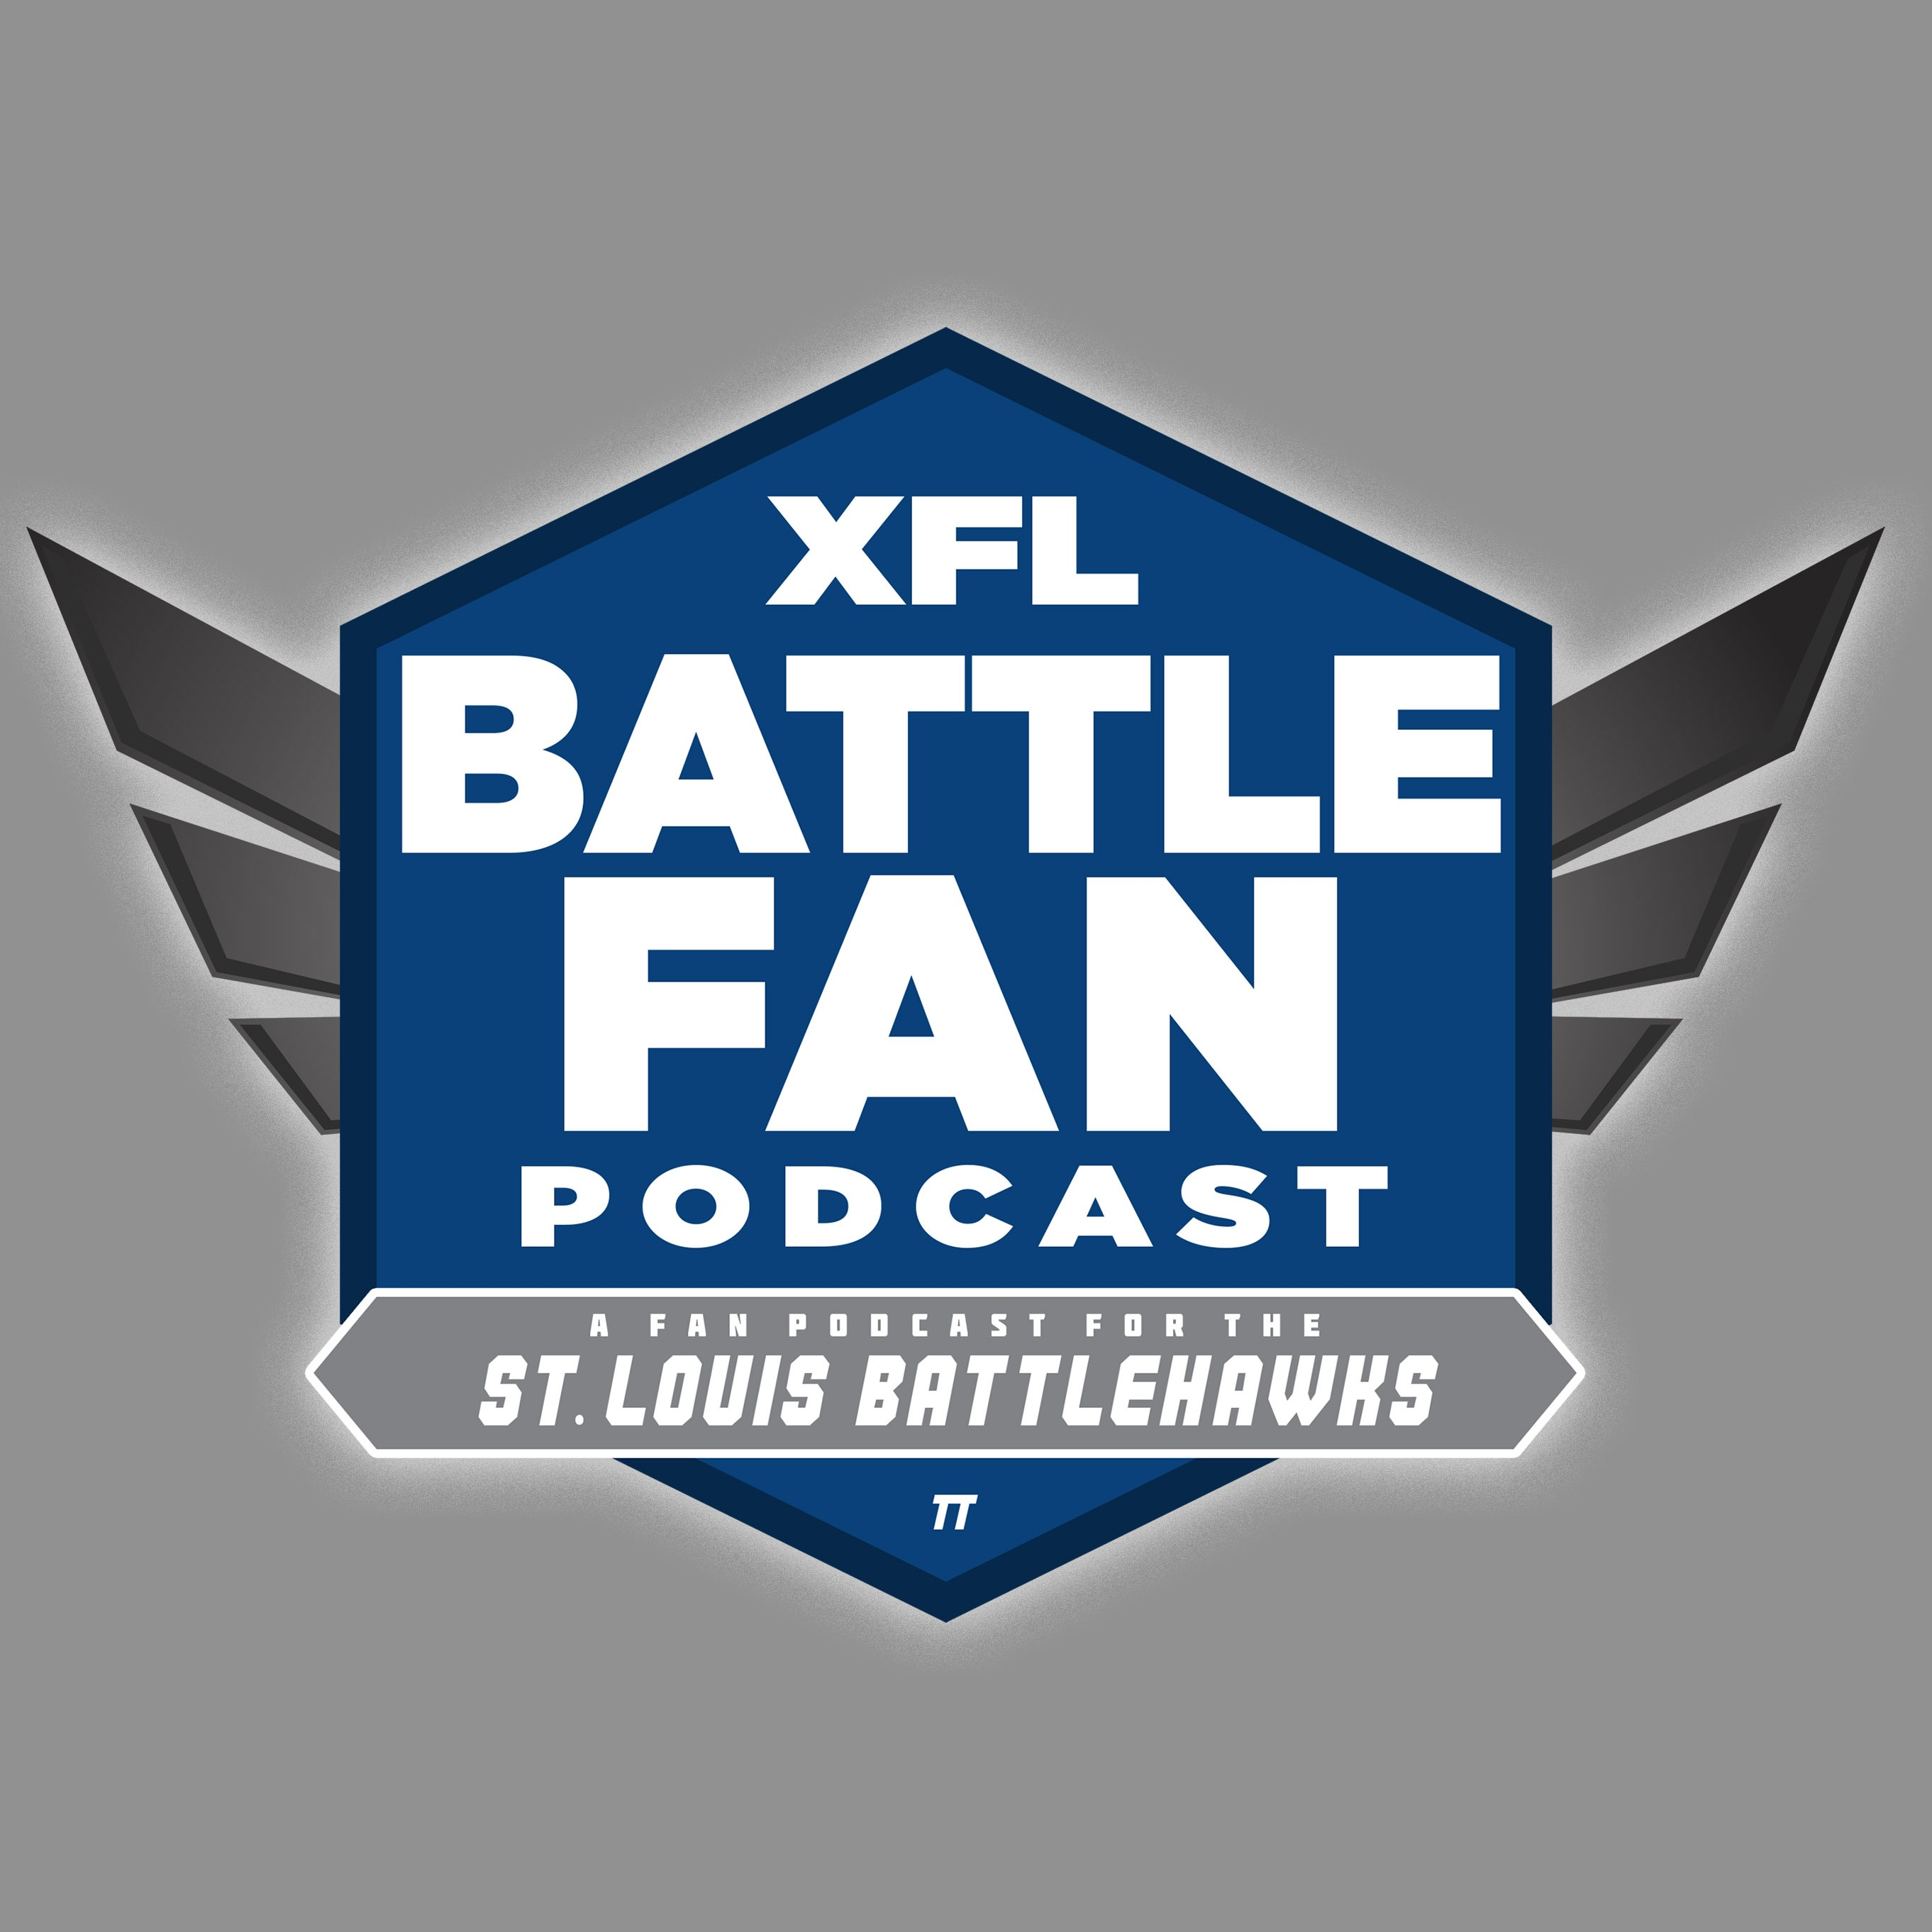 @xflstlfanpodcast Profile Image | Linktree